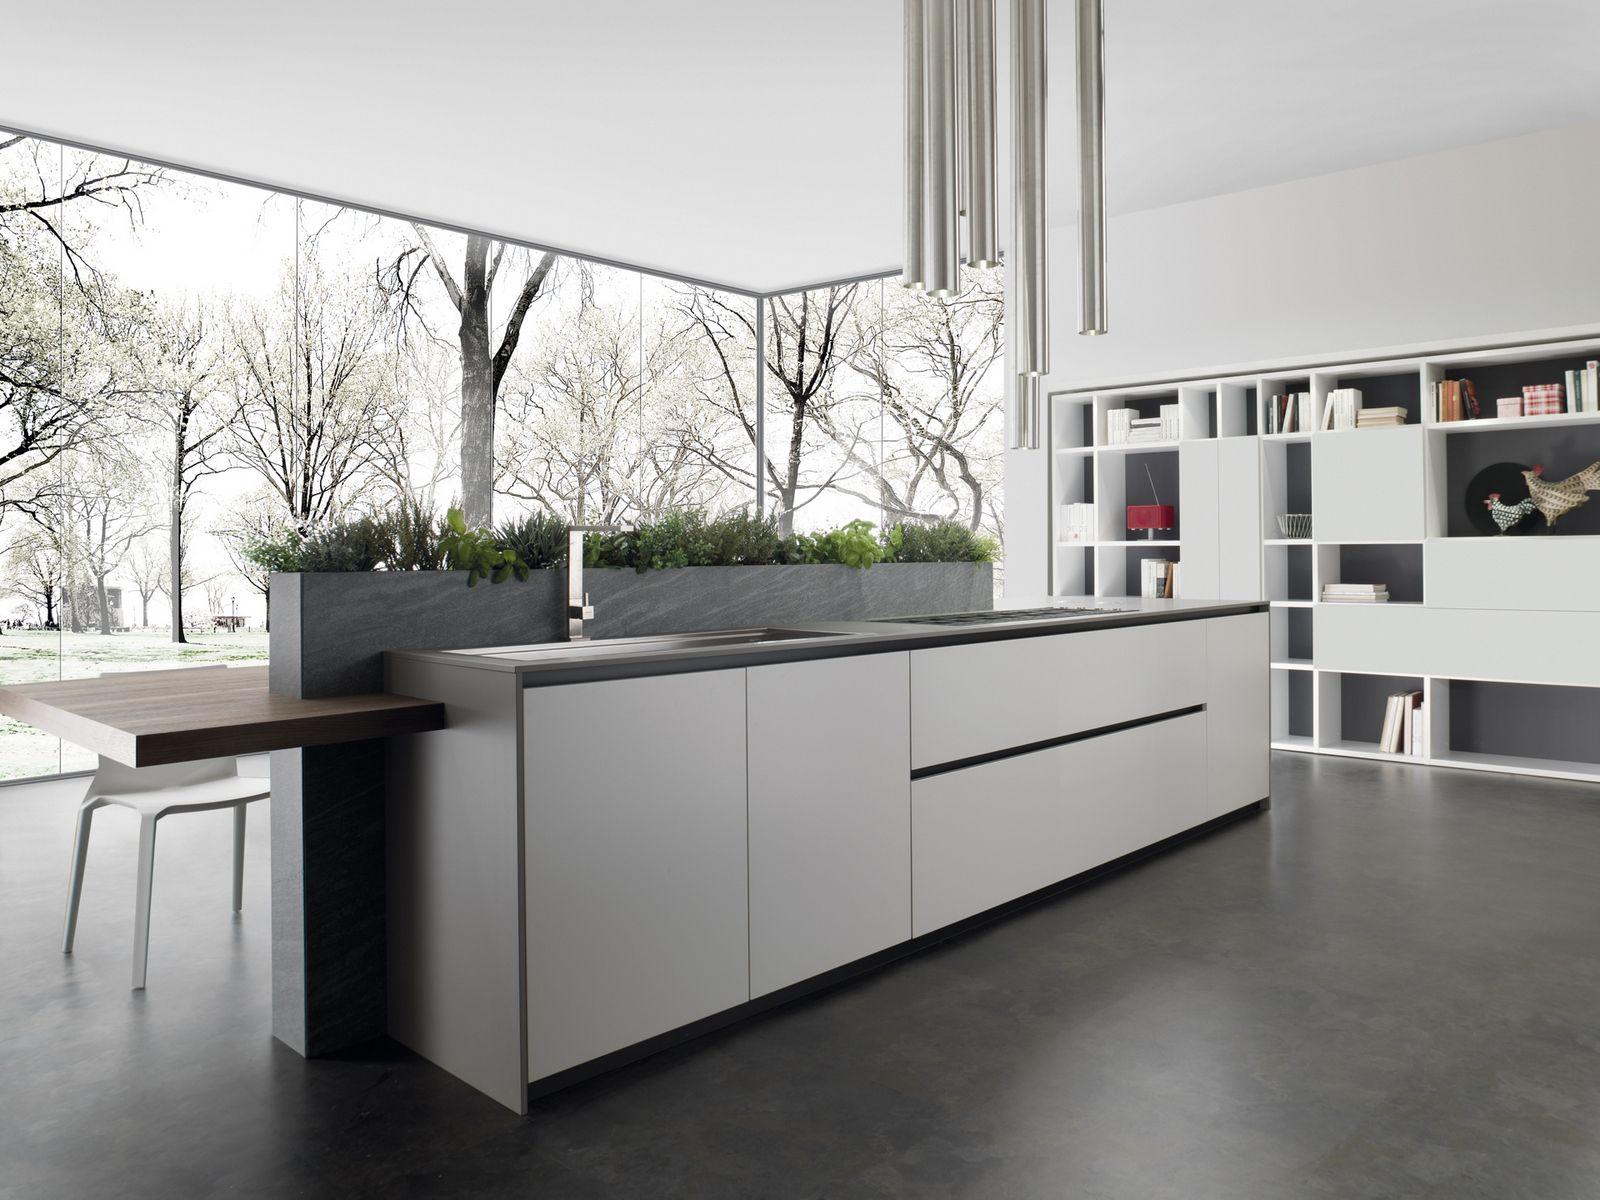 Andromeda cozinha de fenix ntm by floritelli cucine - Cucine floritelli ...